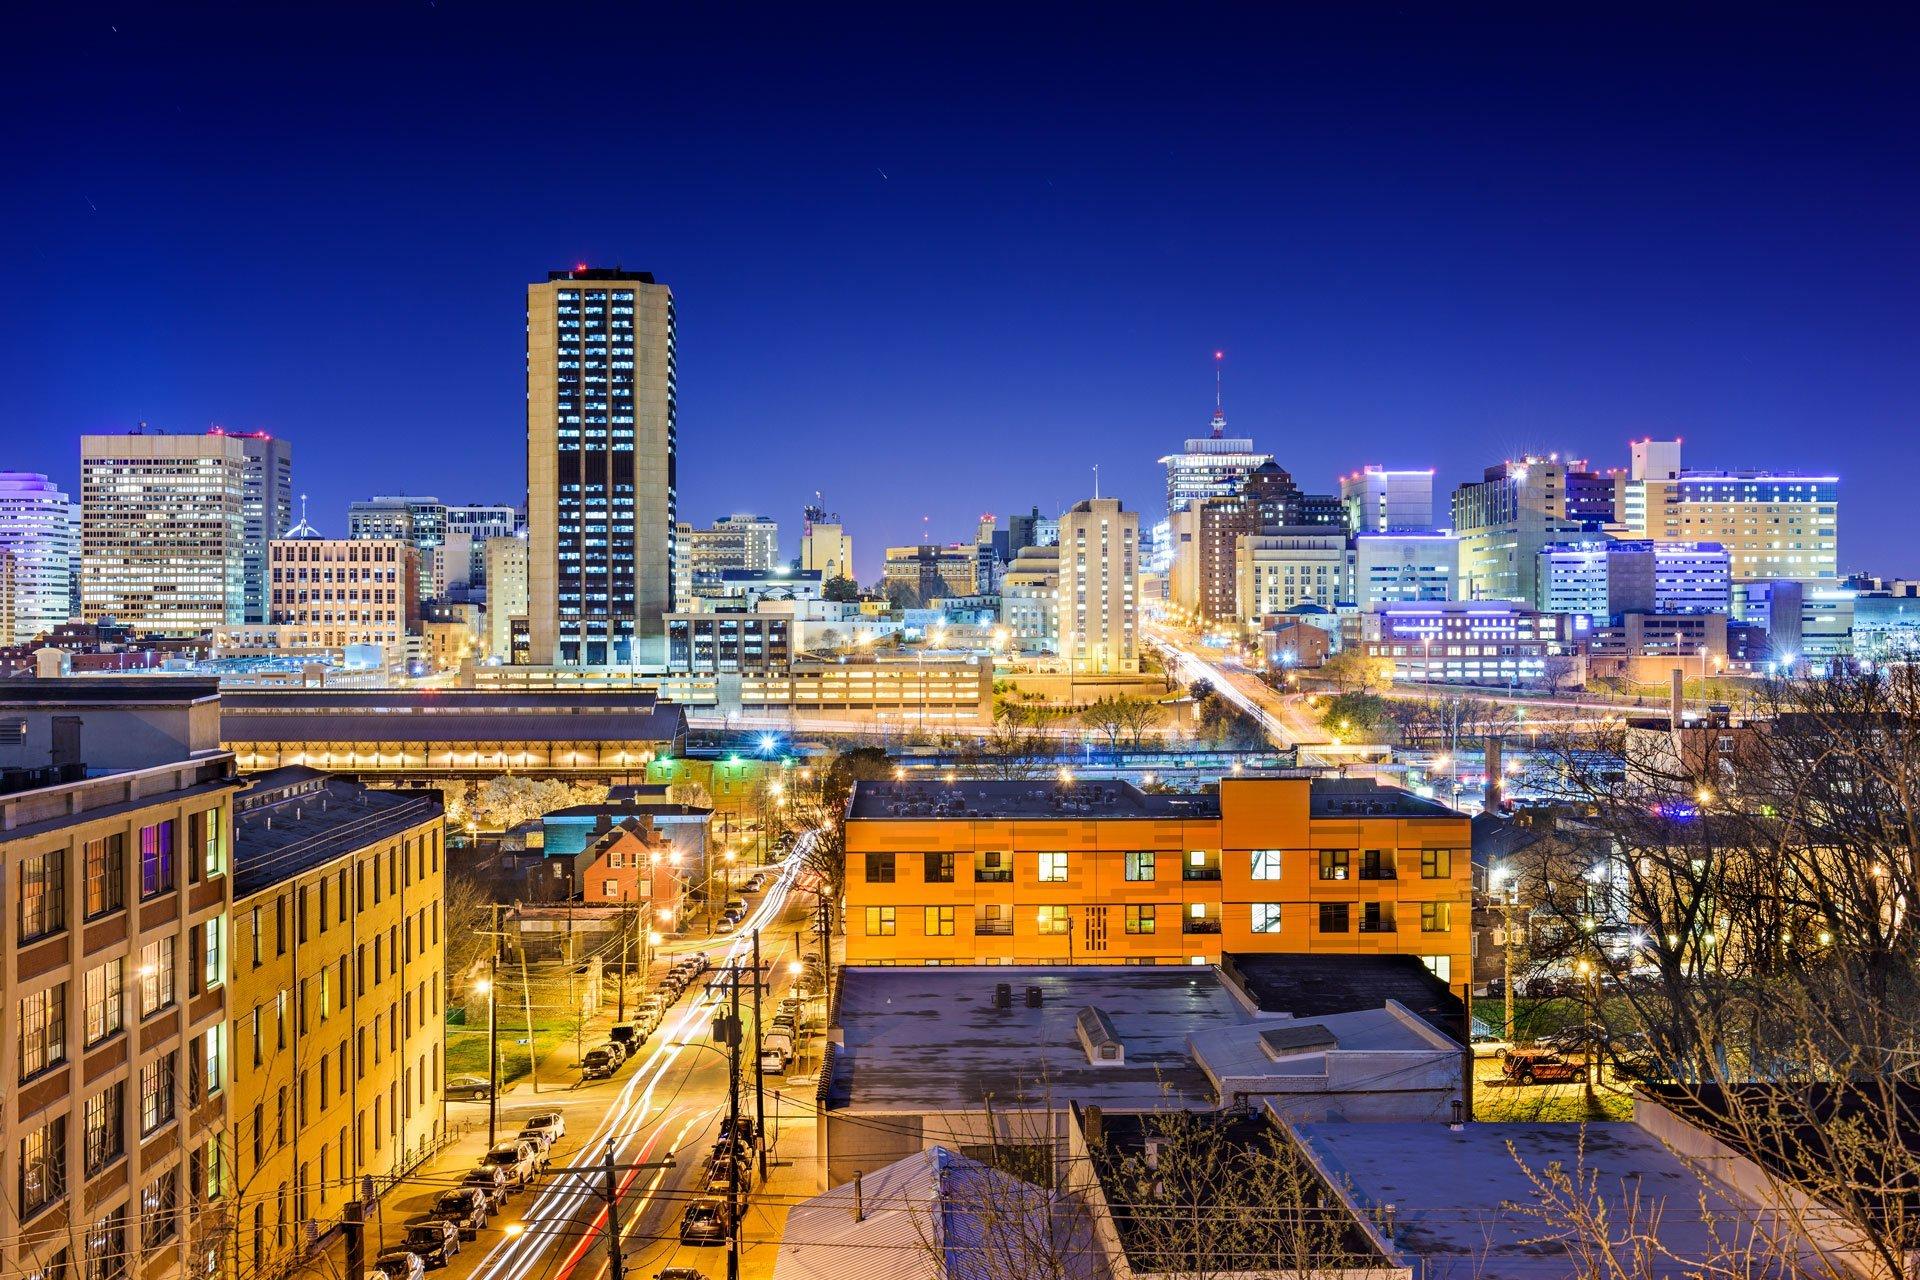 Richmond VA skyline at night with streetlights